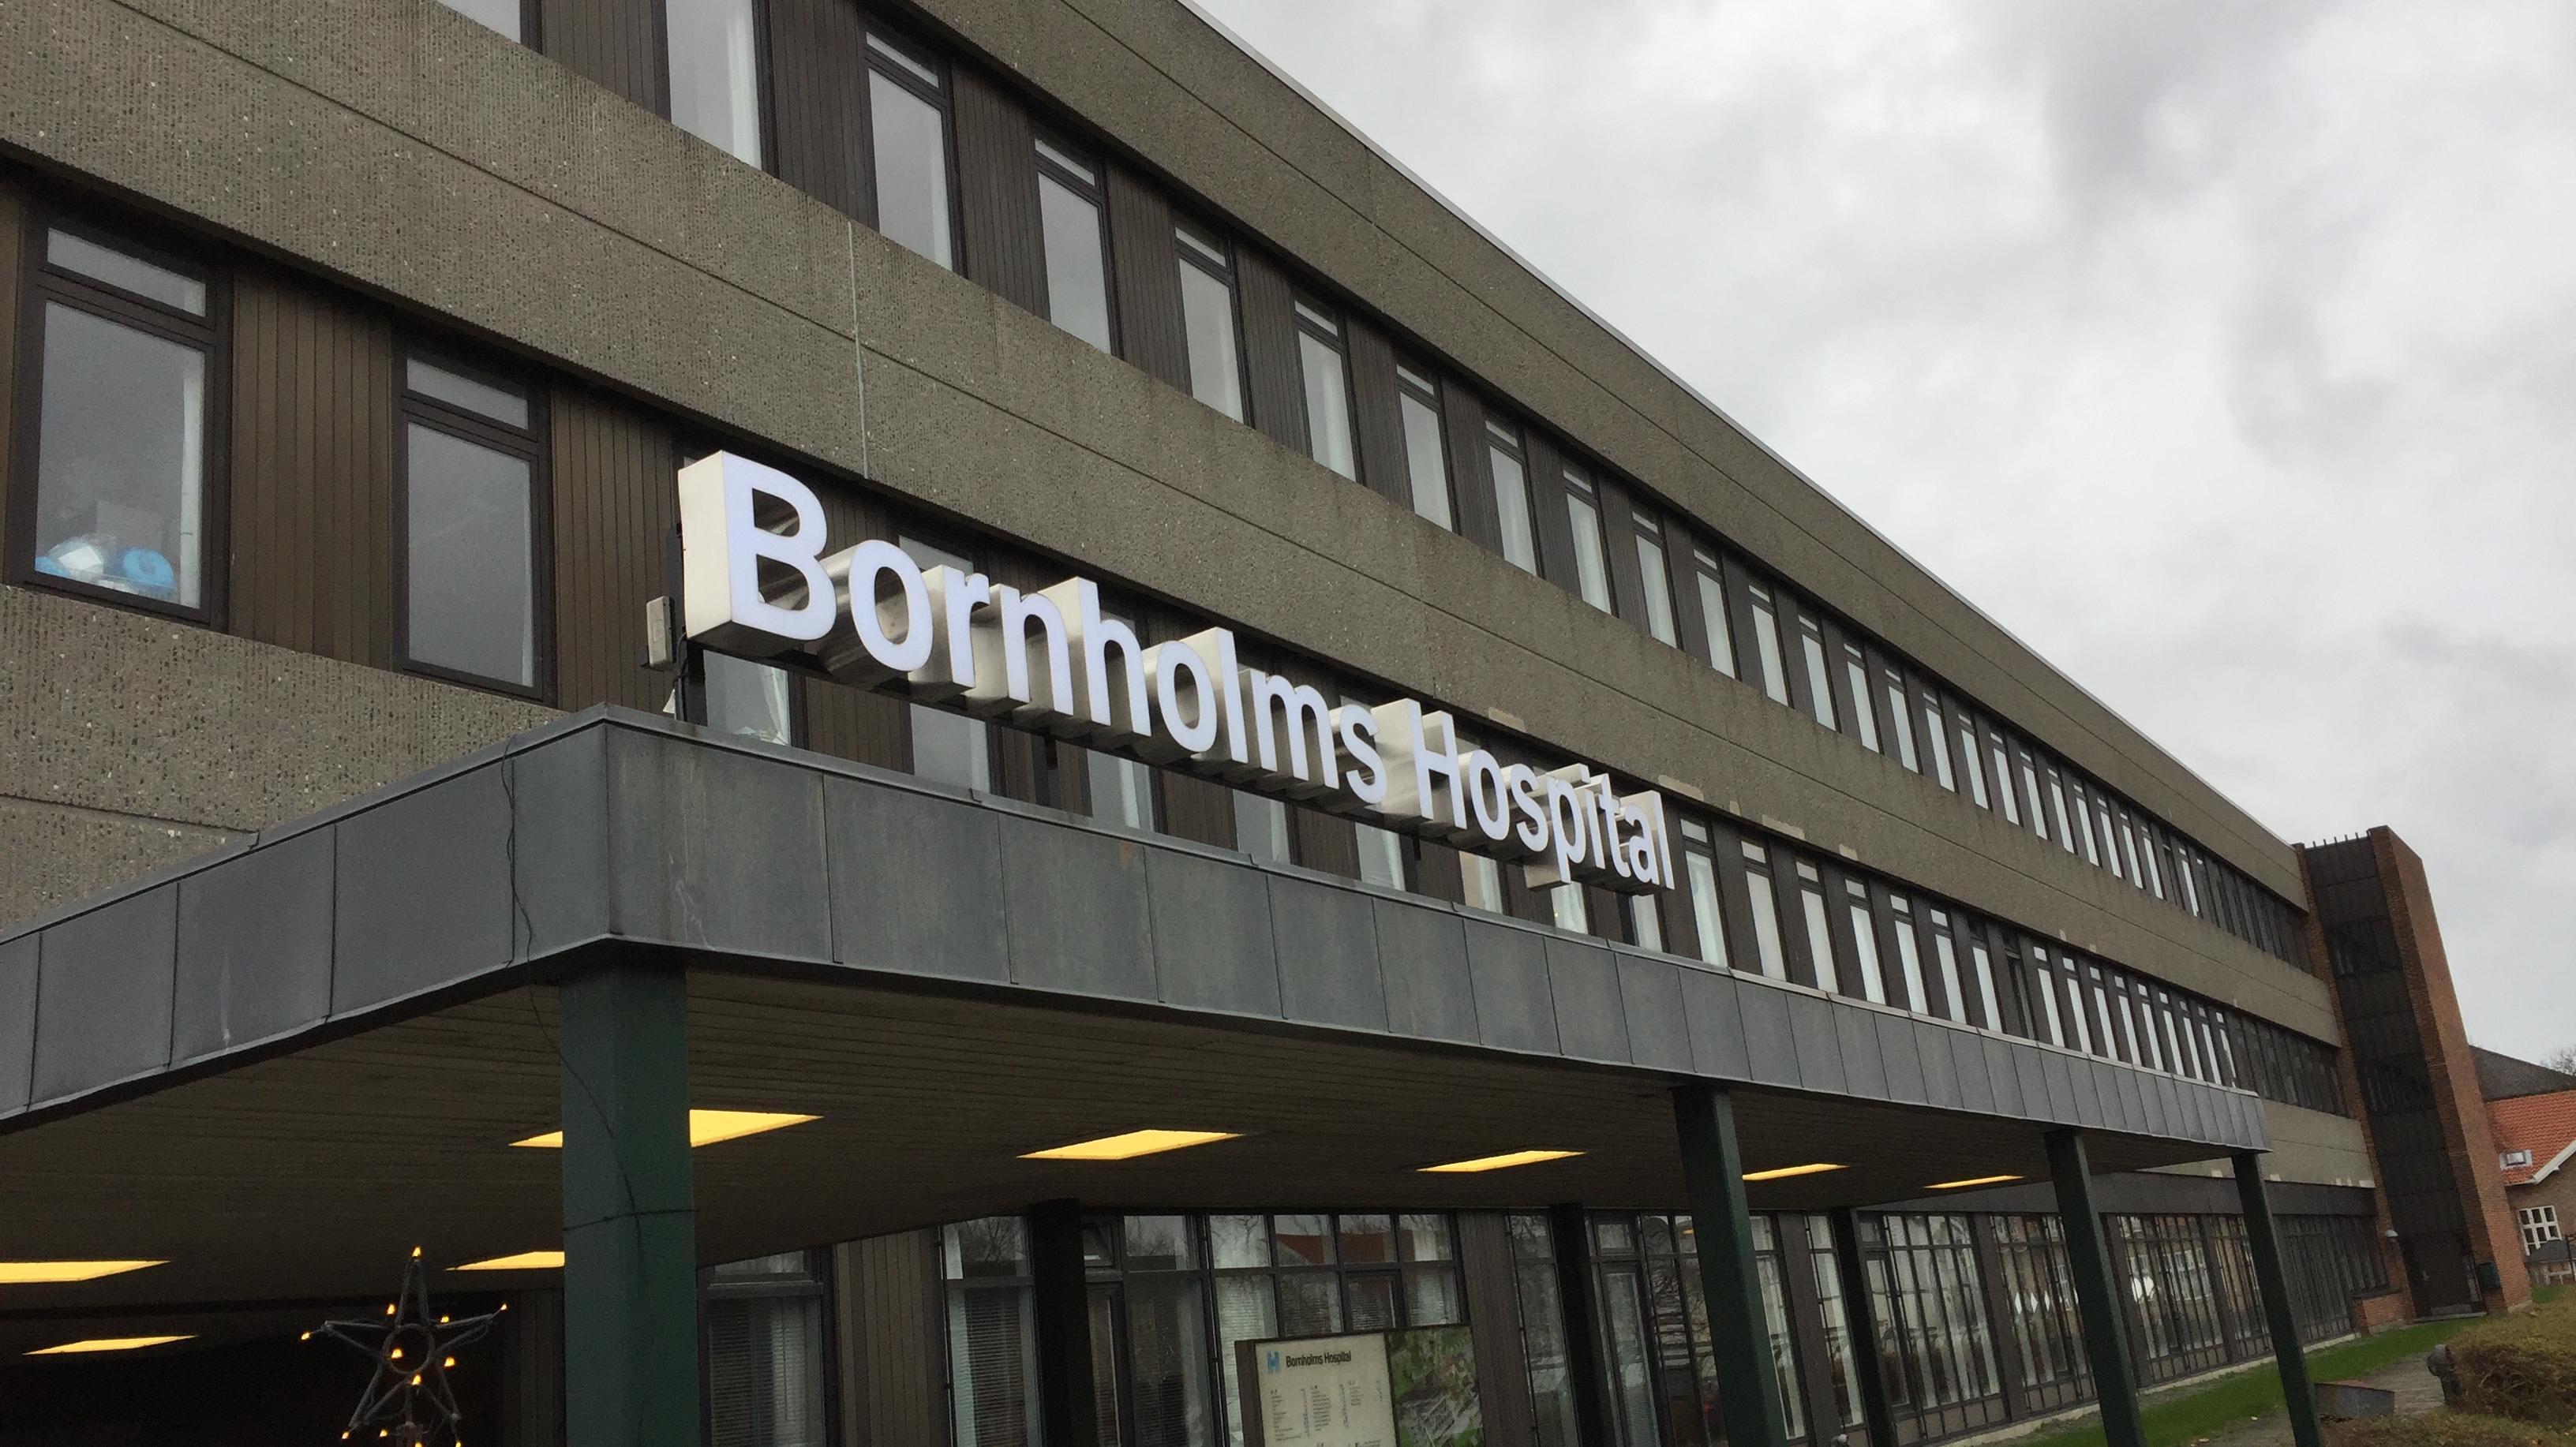 Bornholms Hospital